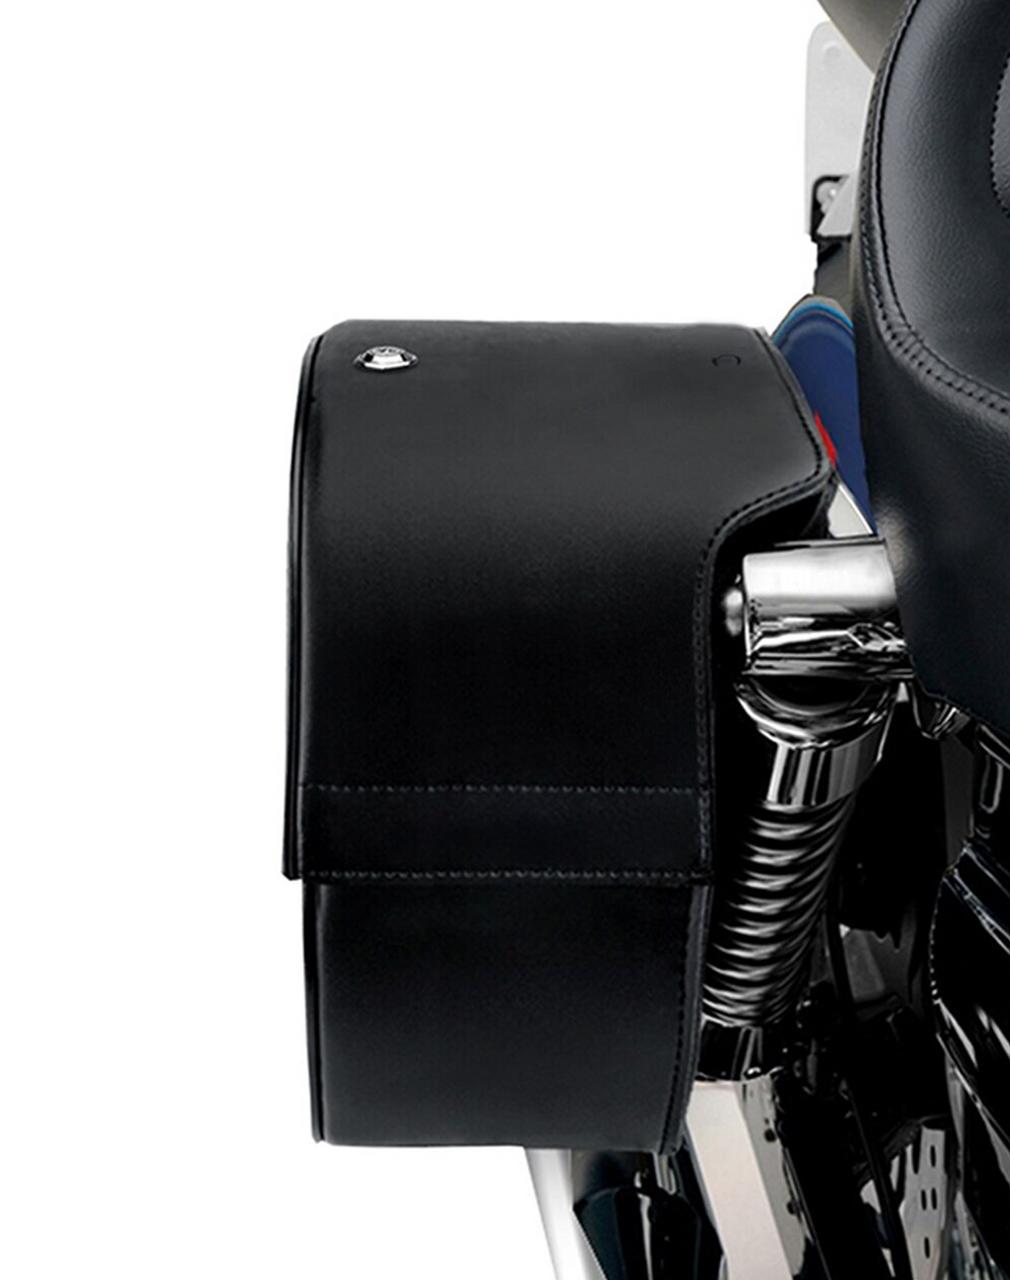 Viking Shock Cutout SS Slanted Studded Large Motorcycle Saddlebags For Harley Street 750 Key Lockable View